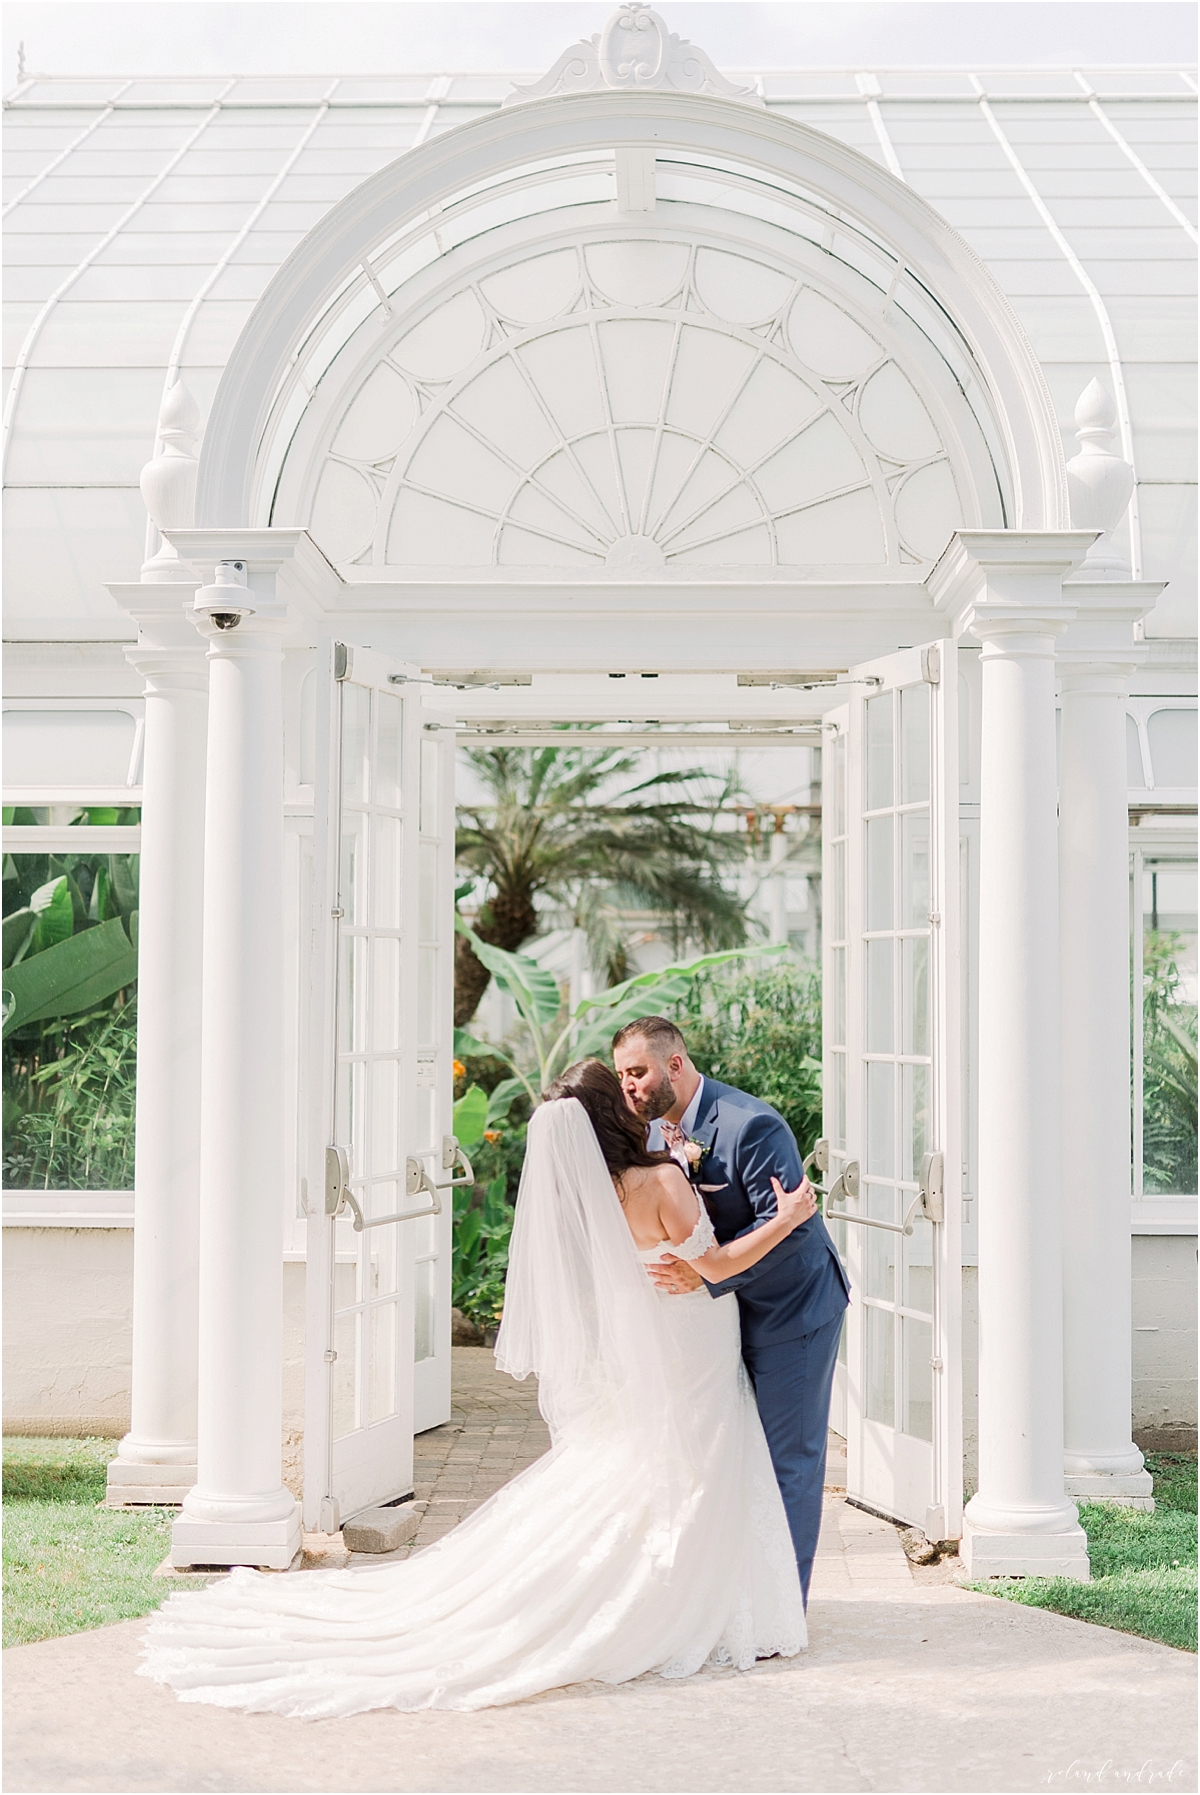 Rancho Los Guzman Wedding Joliet, Joliet Wedding, Joliet Wedding Photographer, Chicago Wedding Photographer, Best Photographer In Joliet, Best Photographer In Chicago, Light And Airy Photographer Chicago_0053.jpg